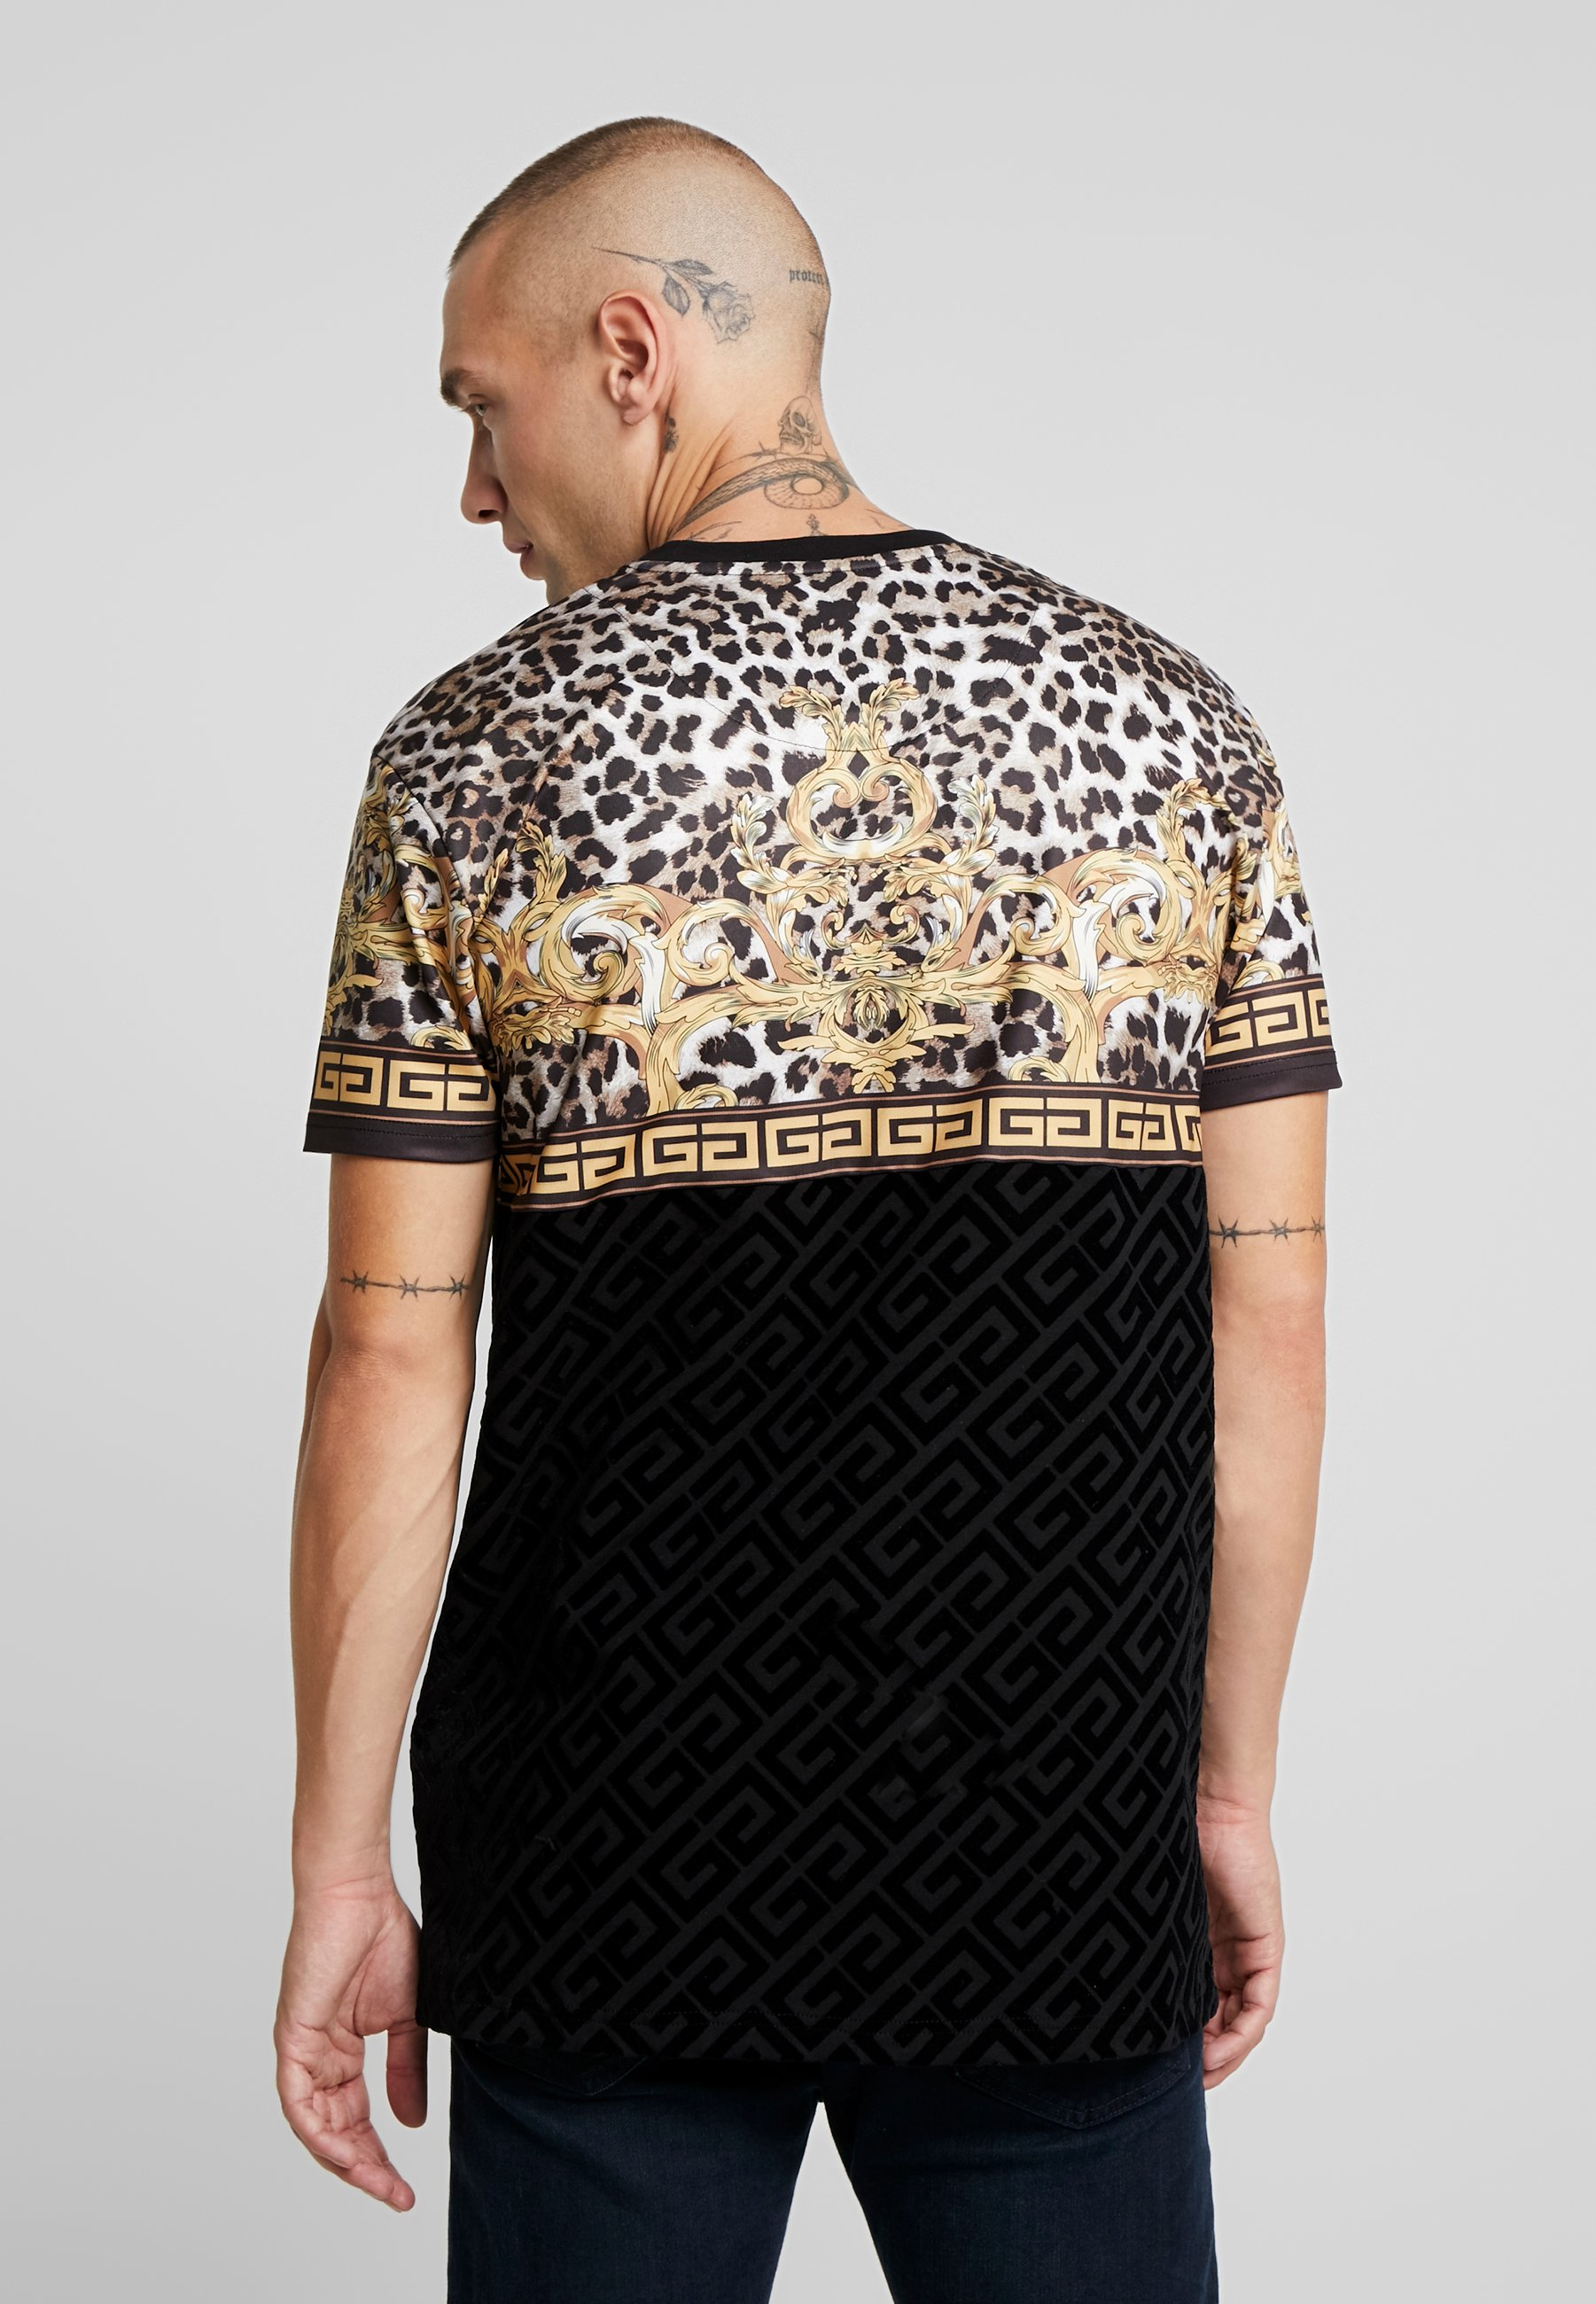 Marno PrintT Black Leopard Gangsta Glorious shirt Imprimé vmNn08w